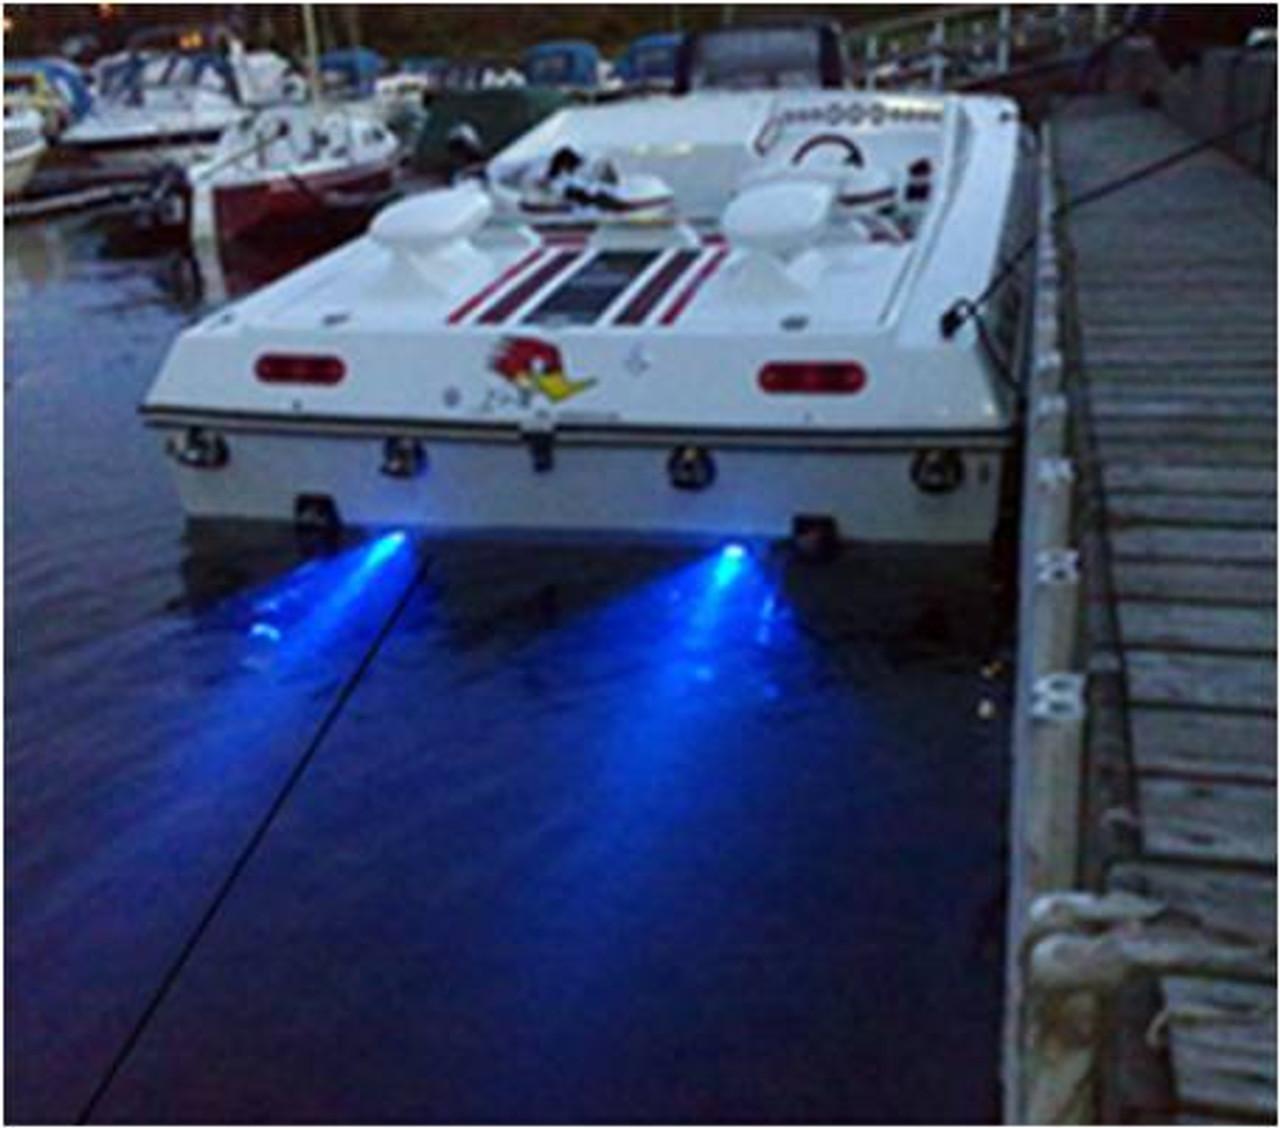 18W, 6-LED Underwater Light for Boat   Salt Water Use